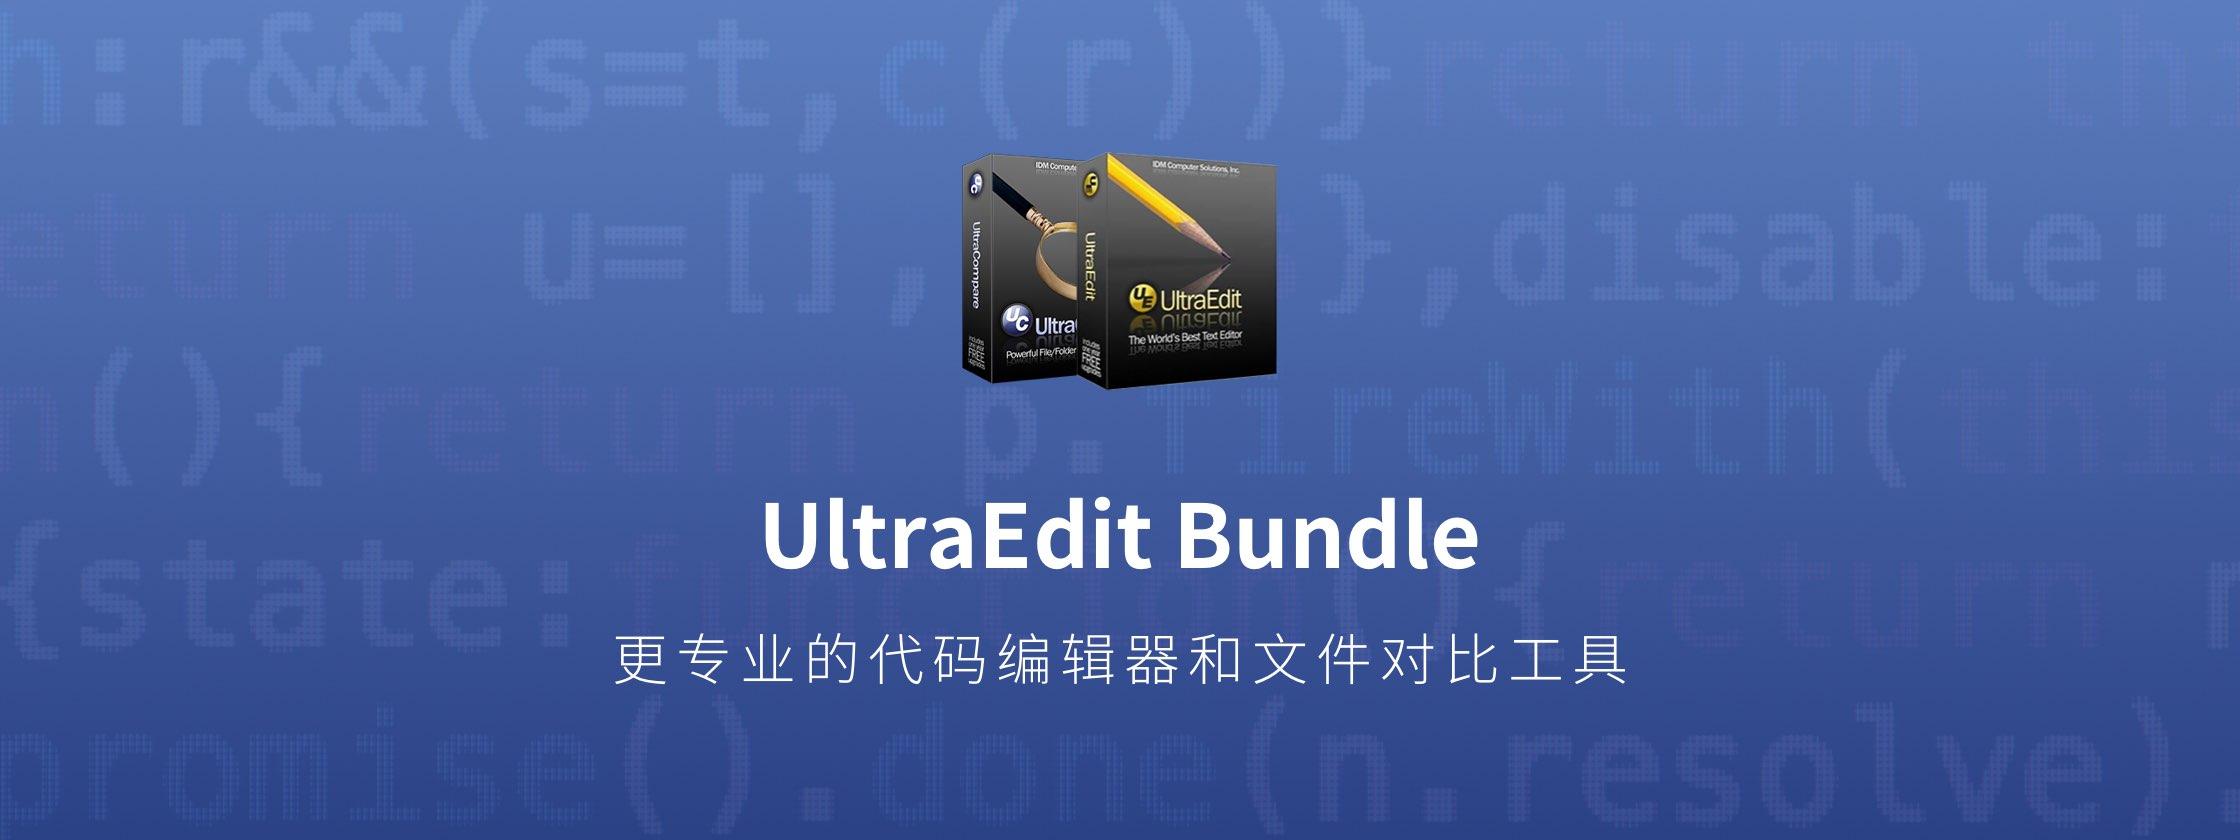 UltraEdit Bundle:更专业的代码编辑器和文件对比工具